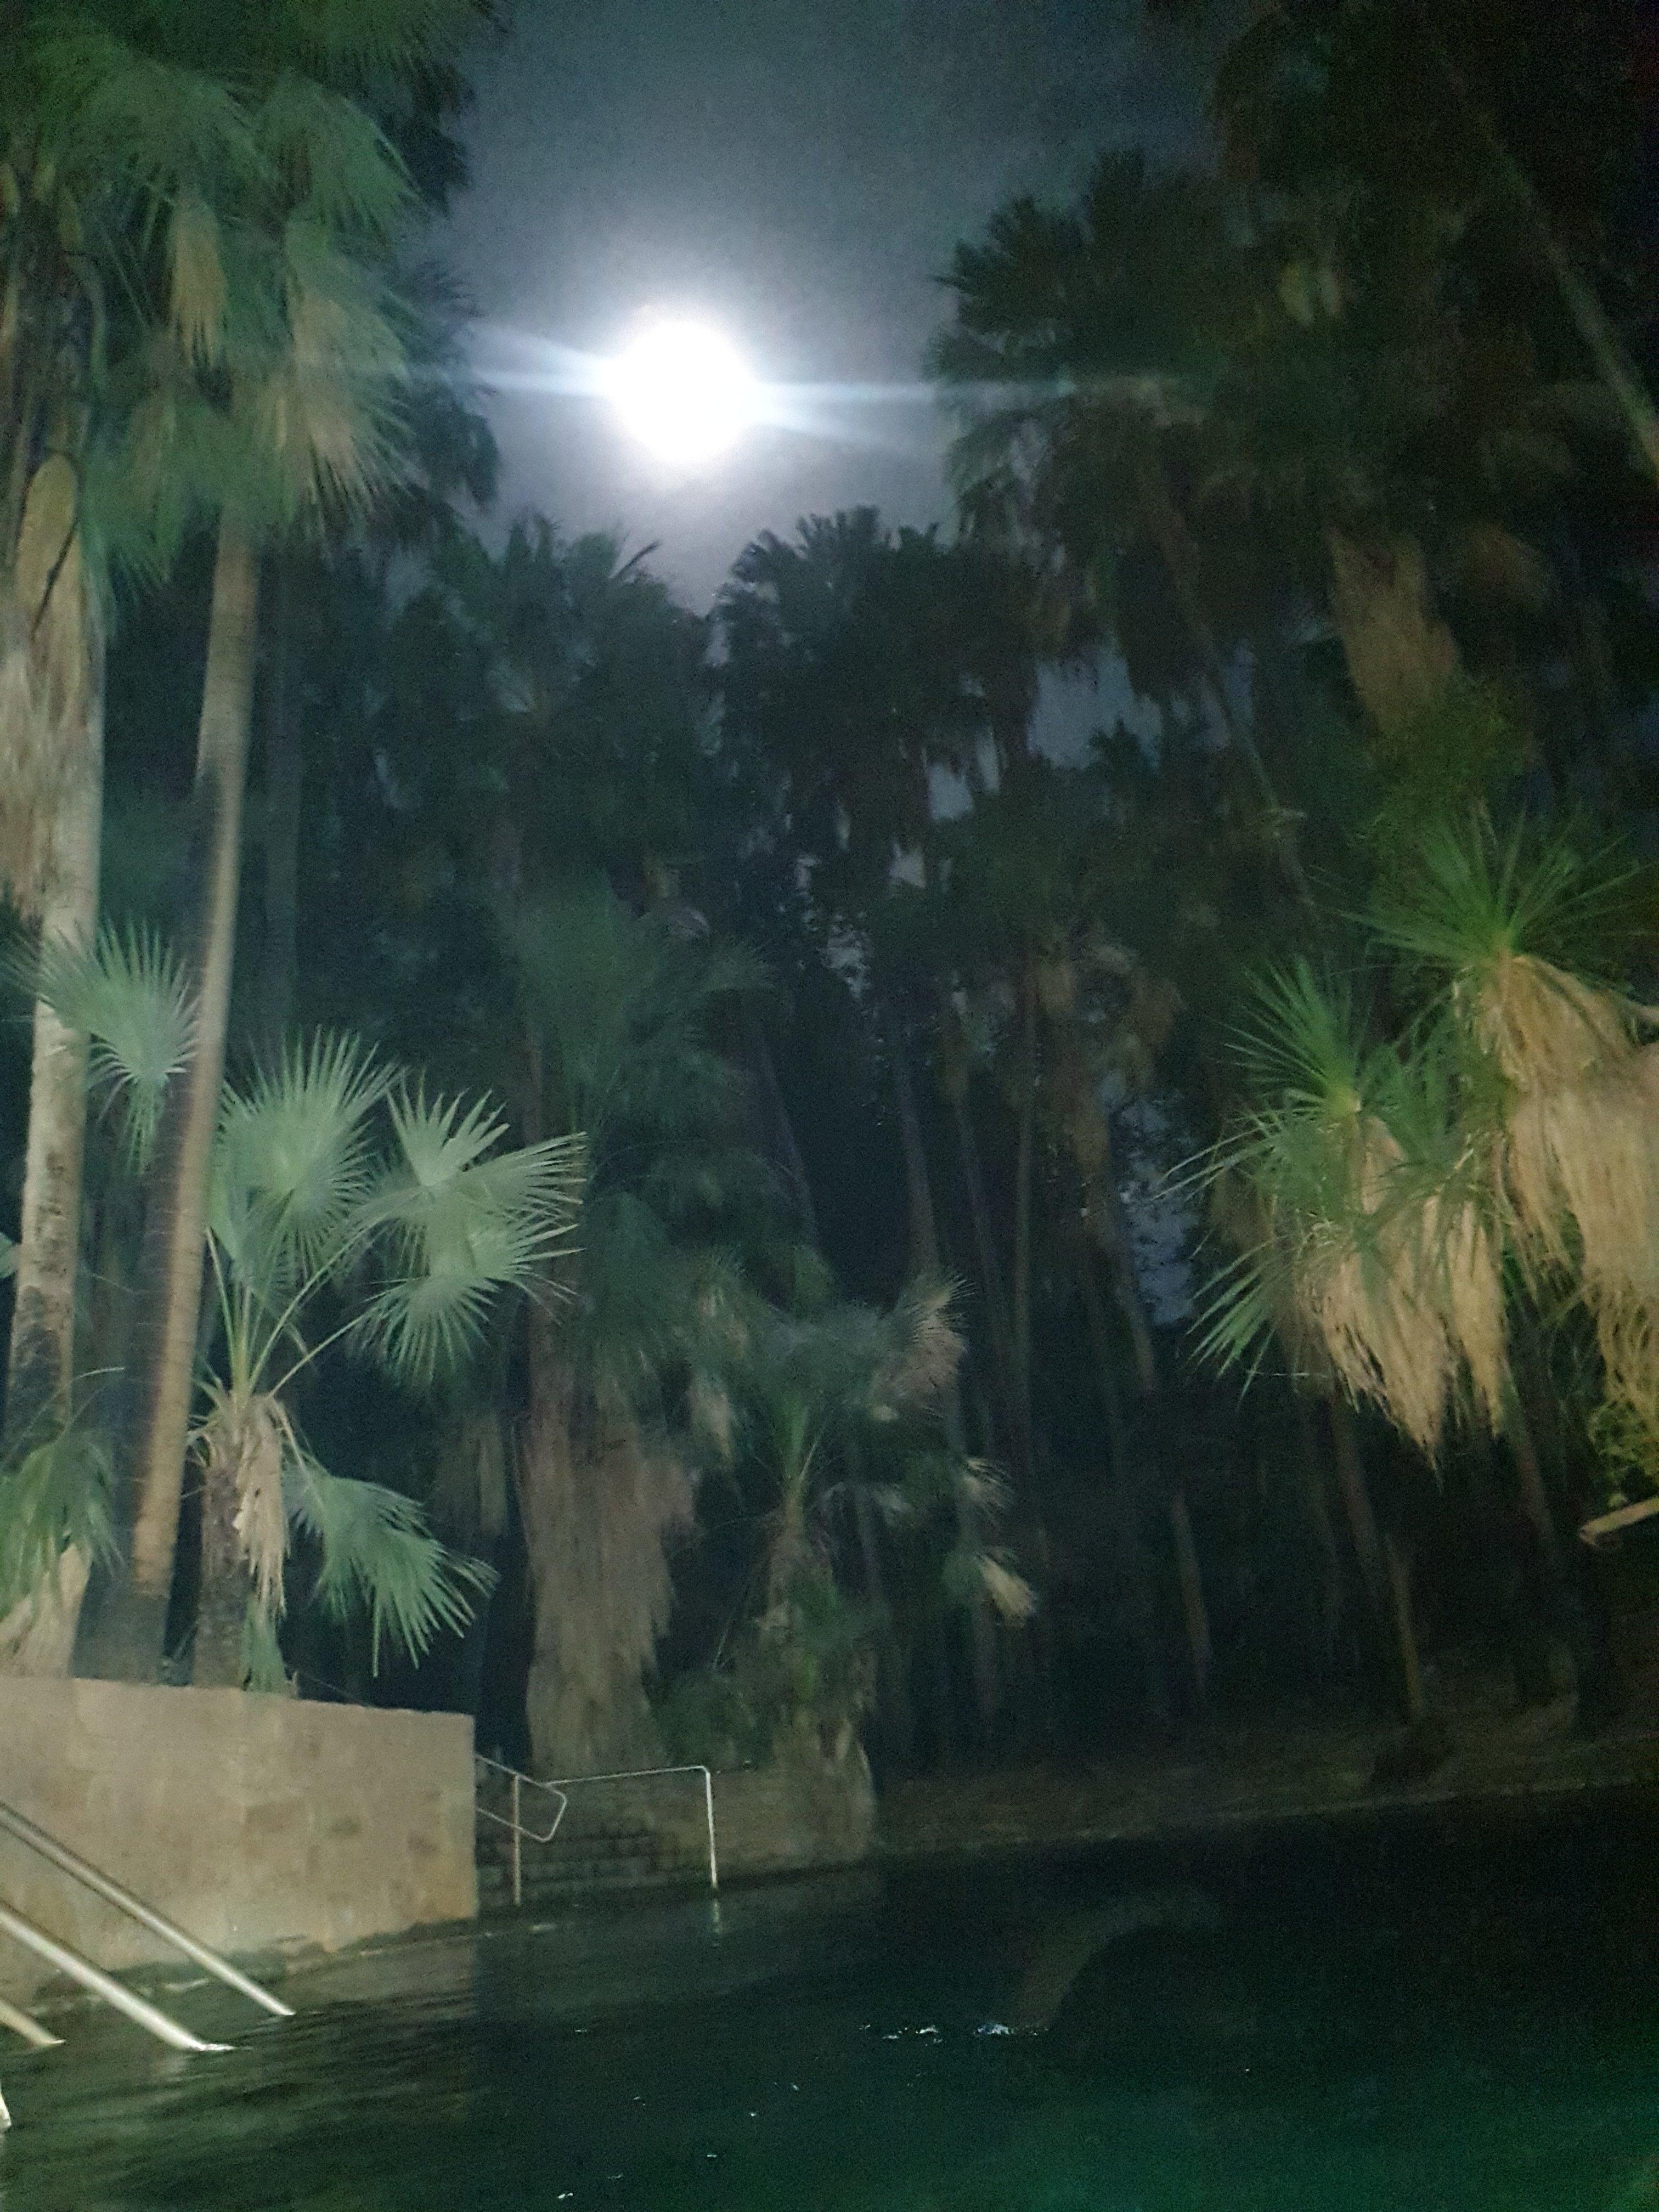 Soaking under a Full Moon